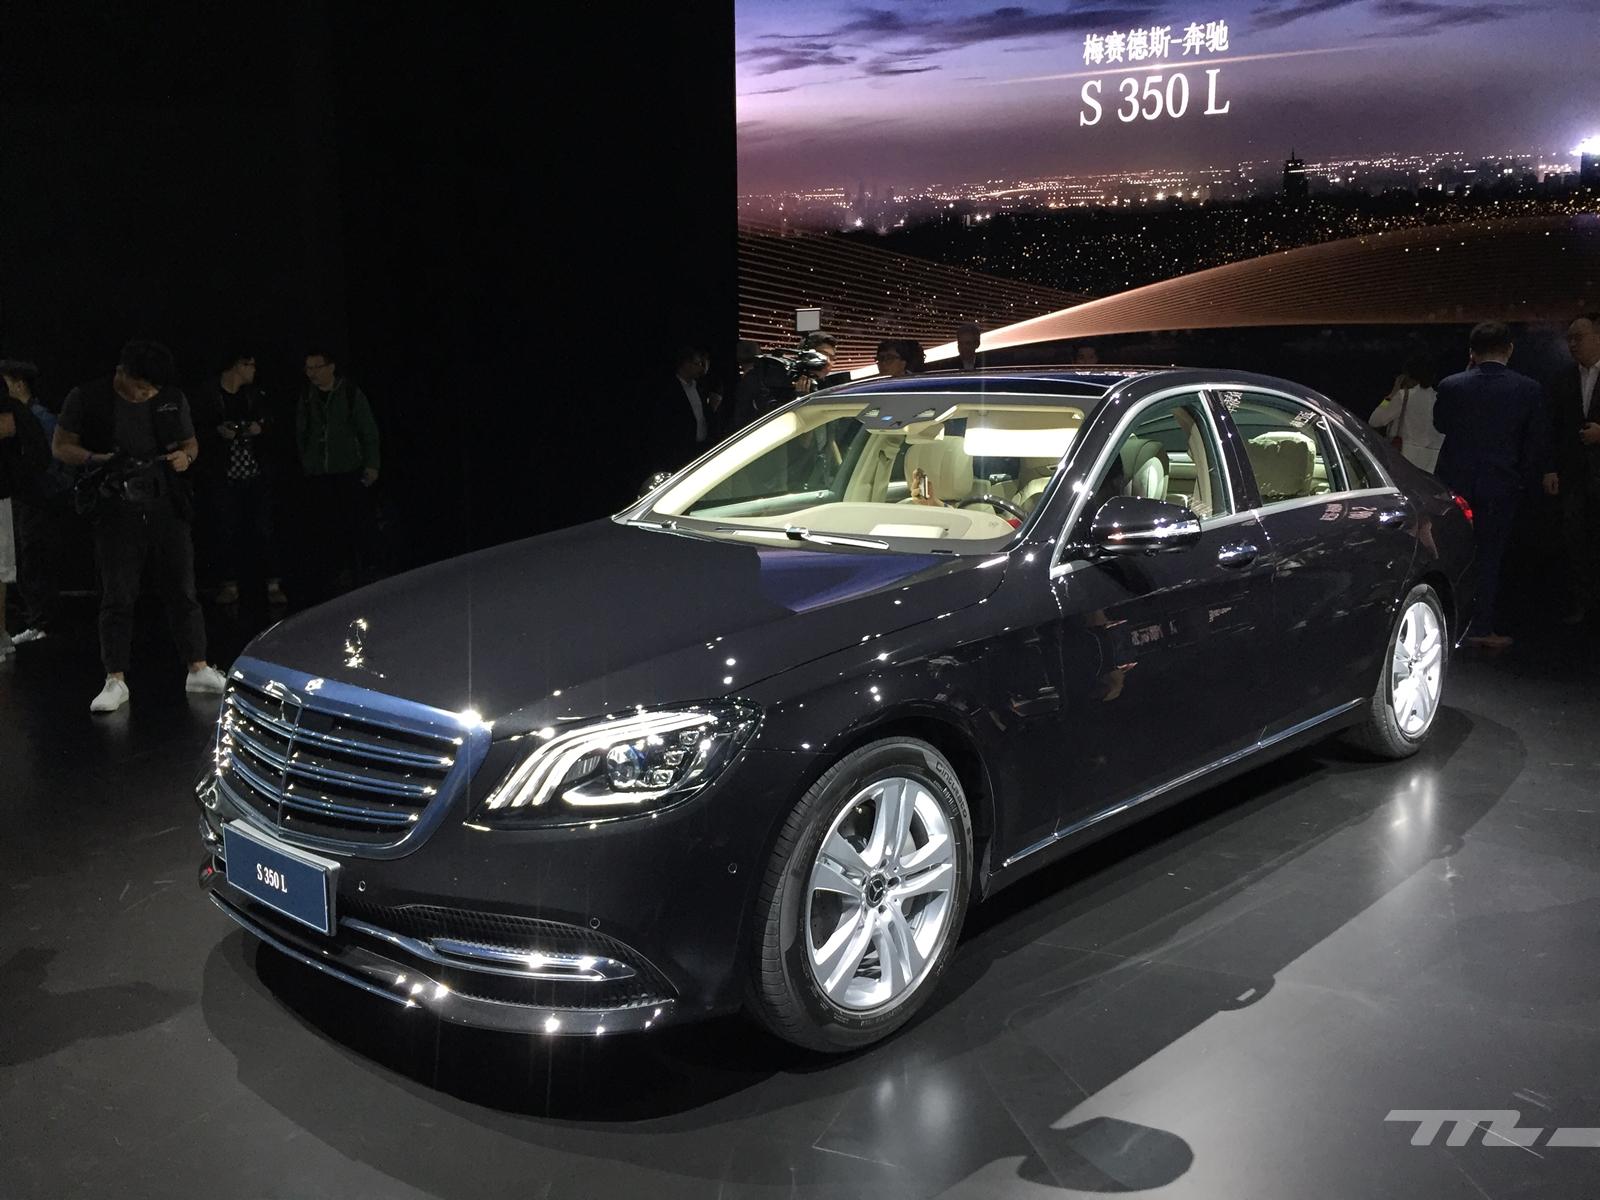 Mercedes benz clase s 2017 la berlina de lujo m s for Mercedes benz 2017 precio